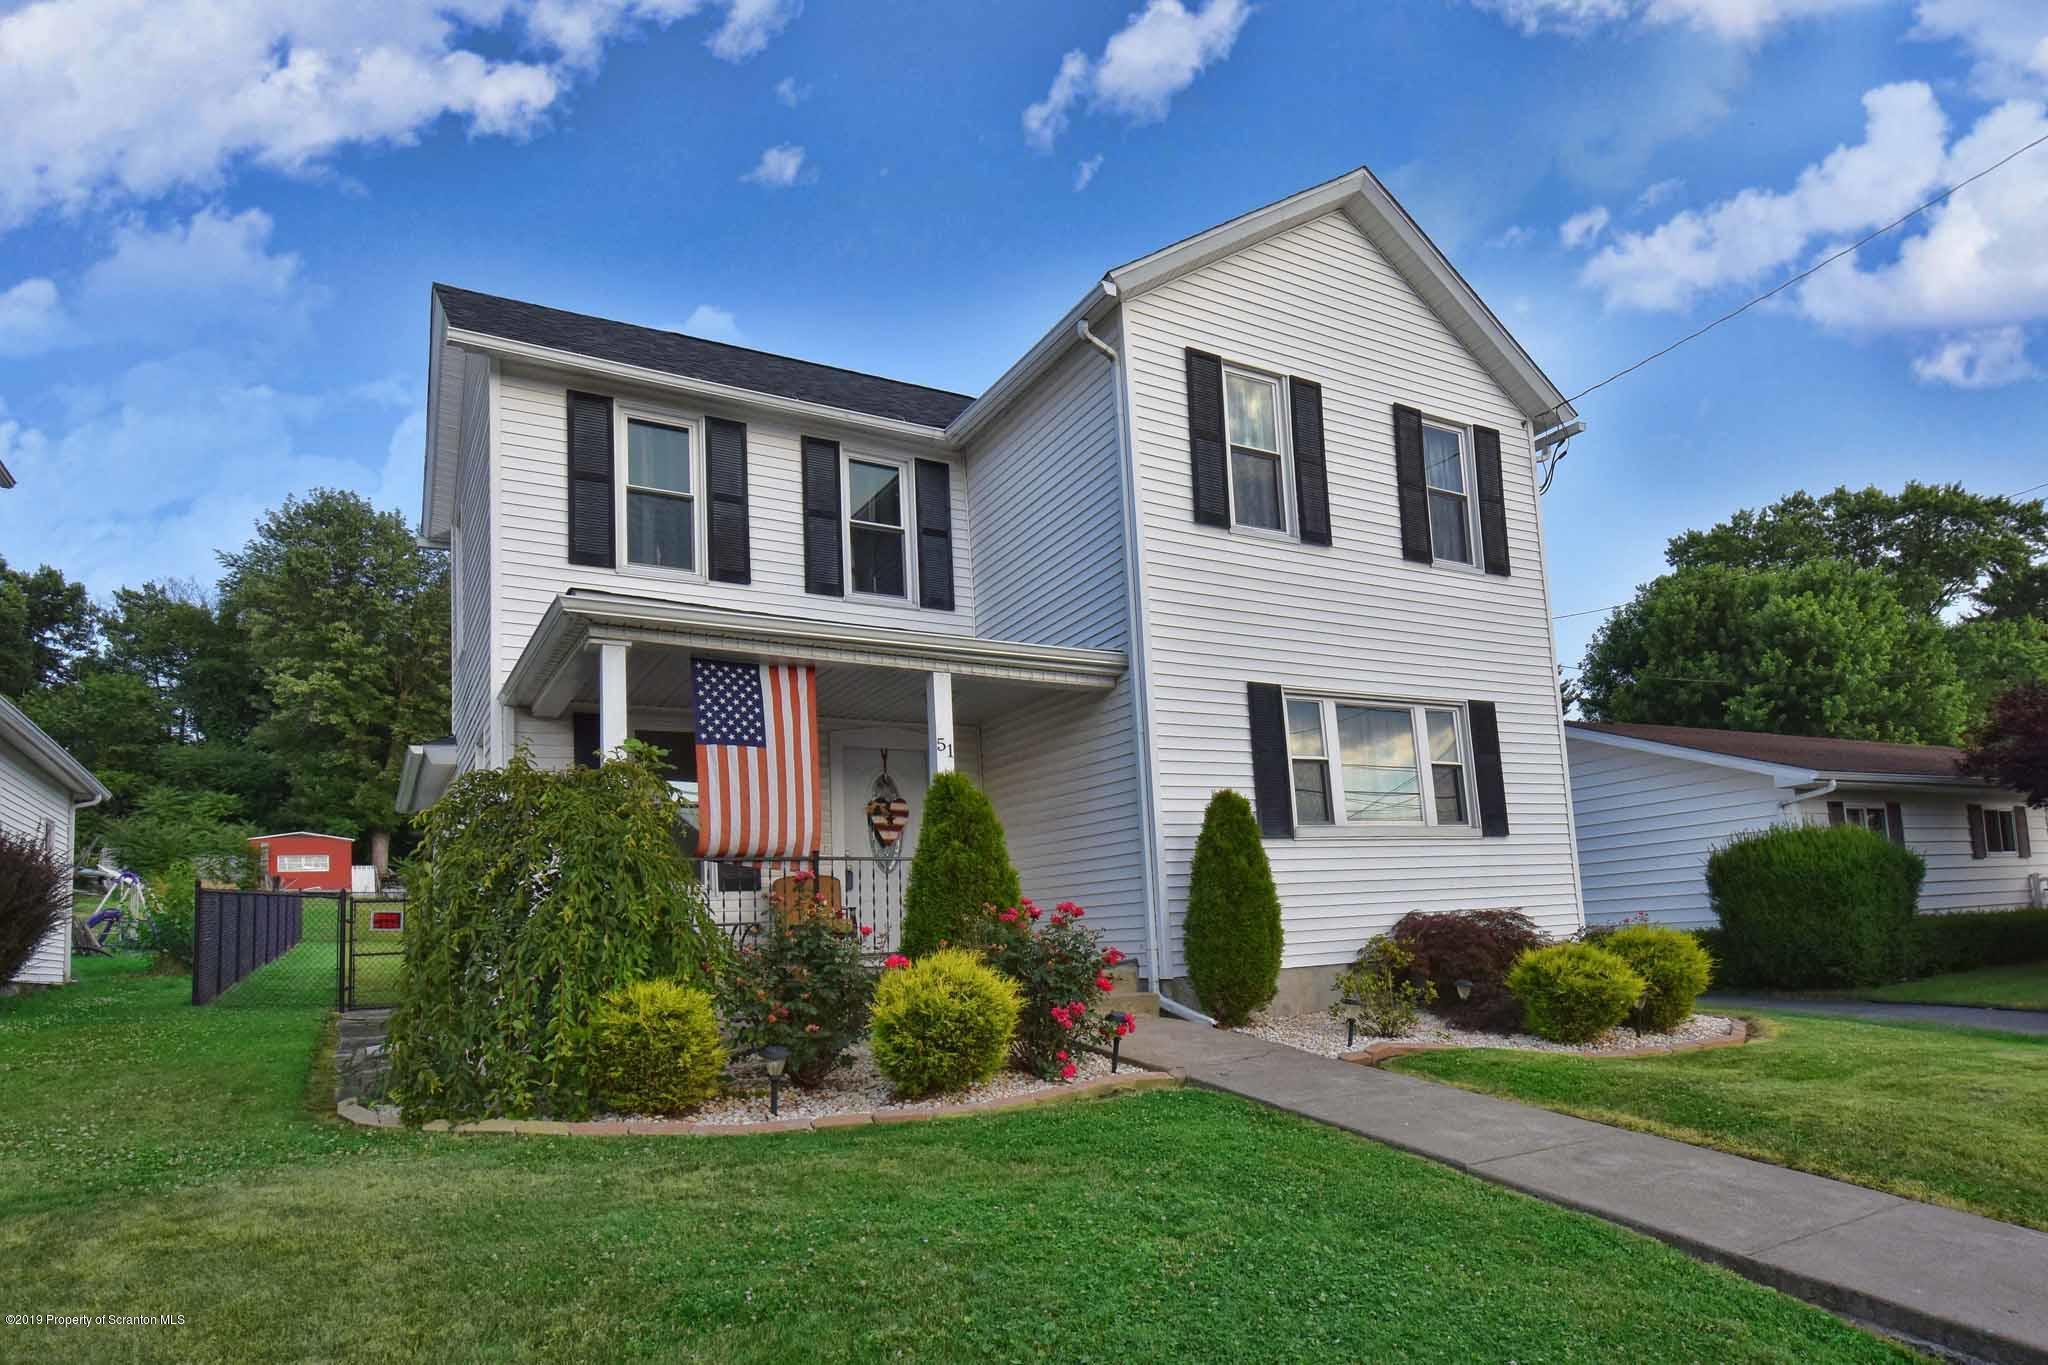 51 Washington Ter, Pittston, Pennsylvania 18640, 3 Bedrooms Bedrooms, 6 Rooms Rooms,2 BathroomsBathrooms,Single Family,For Sale,Washington Ter,19-2992